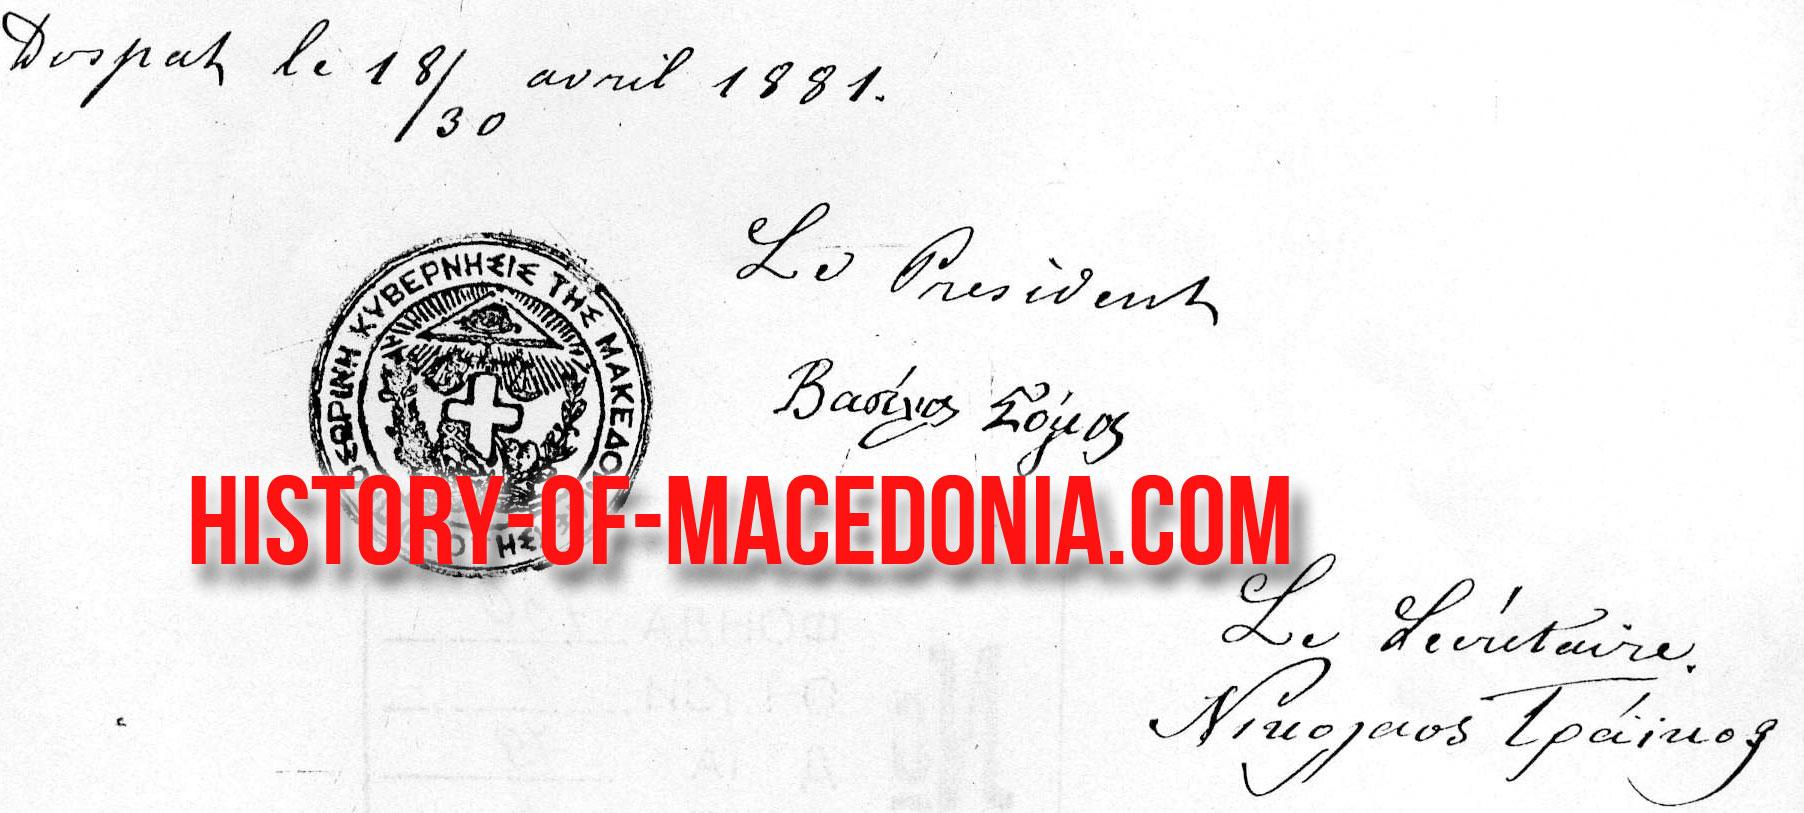 ypografes somos traikos Η «Προσωρινή Κυβέρνηση της Μακεδονίας» (1880 81)